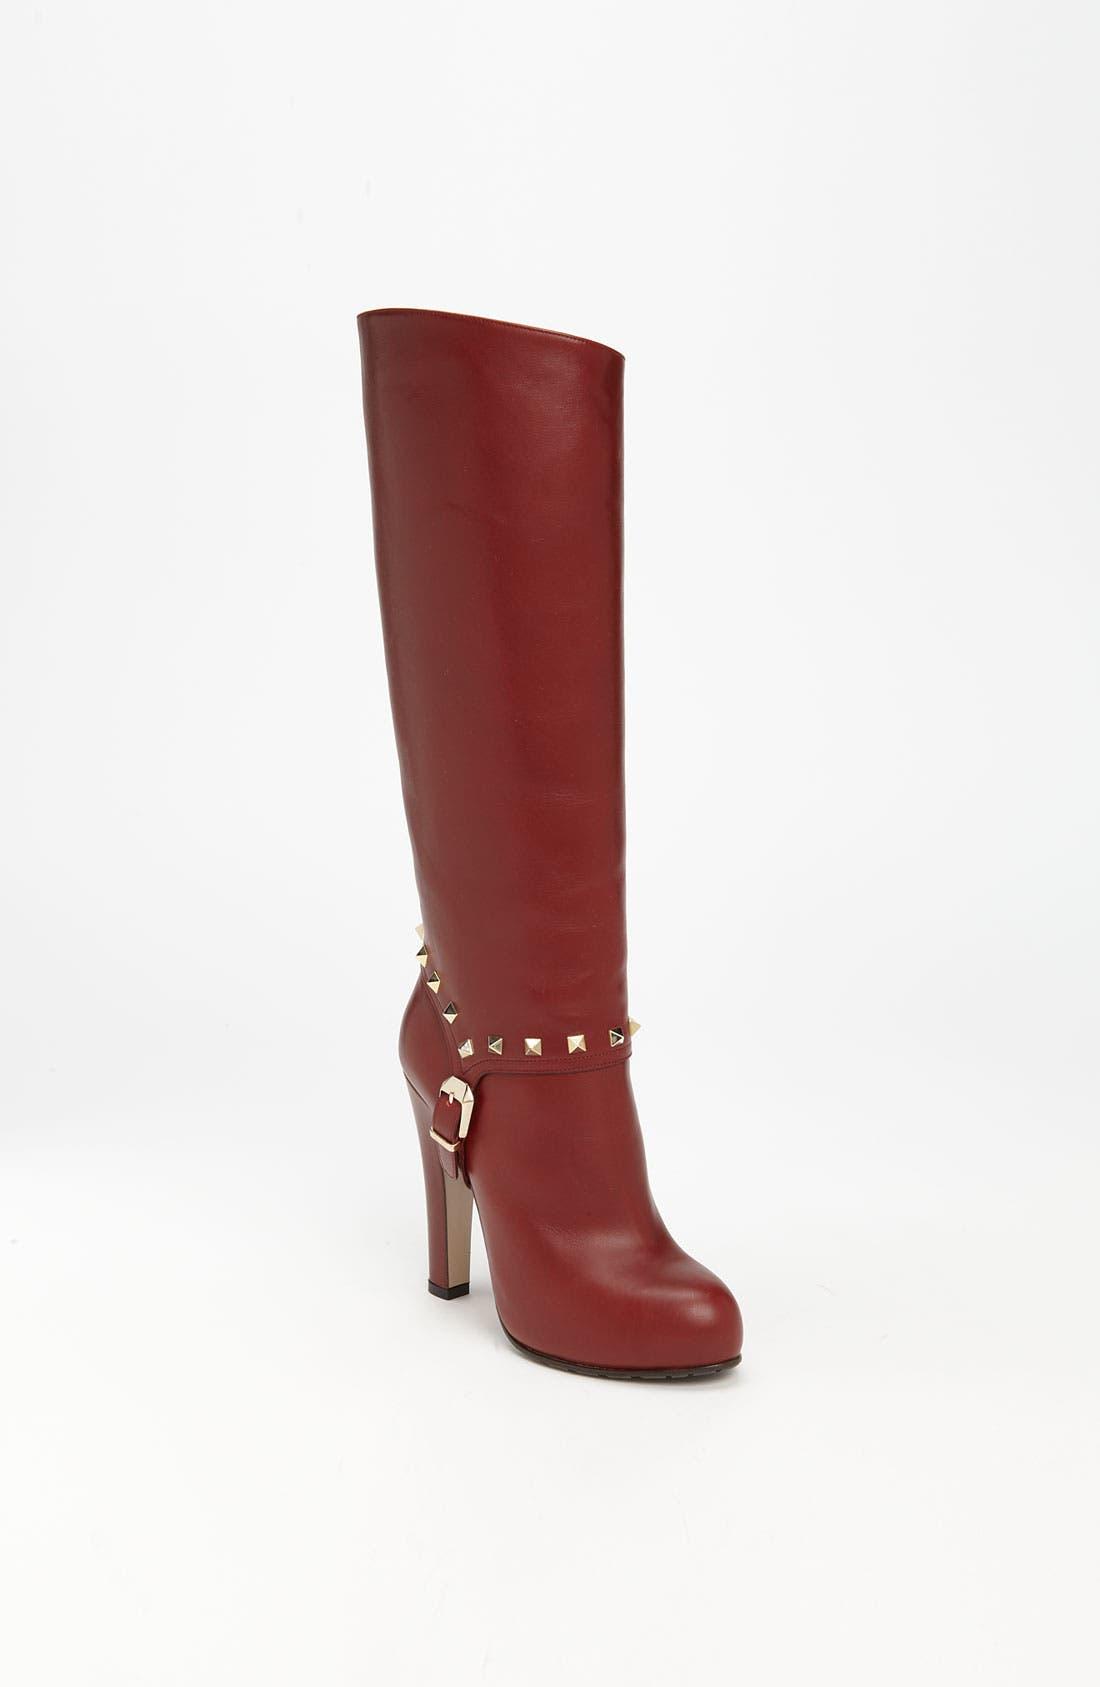 Alternate Image 1 Selected - VALENTINO GARAVANI 'Rockstud' Tall Boot